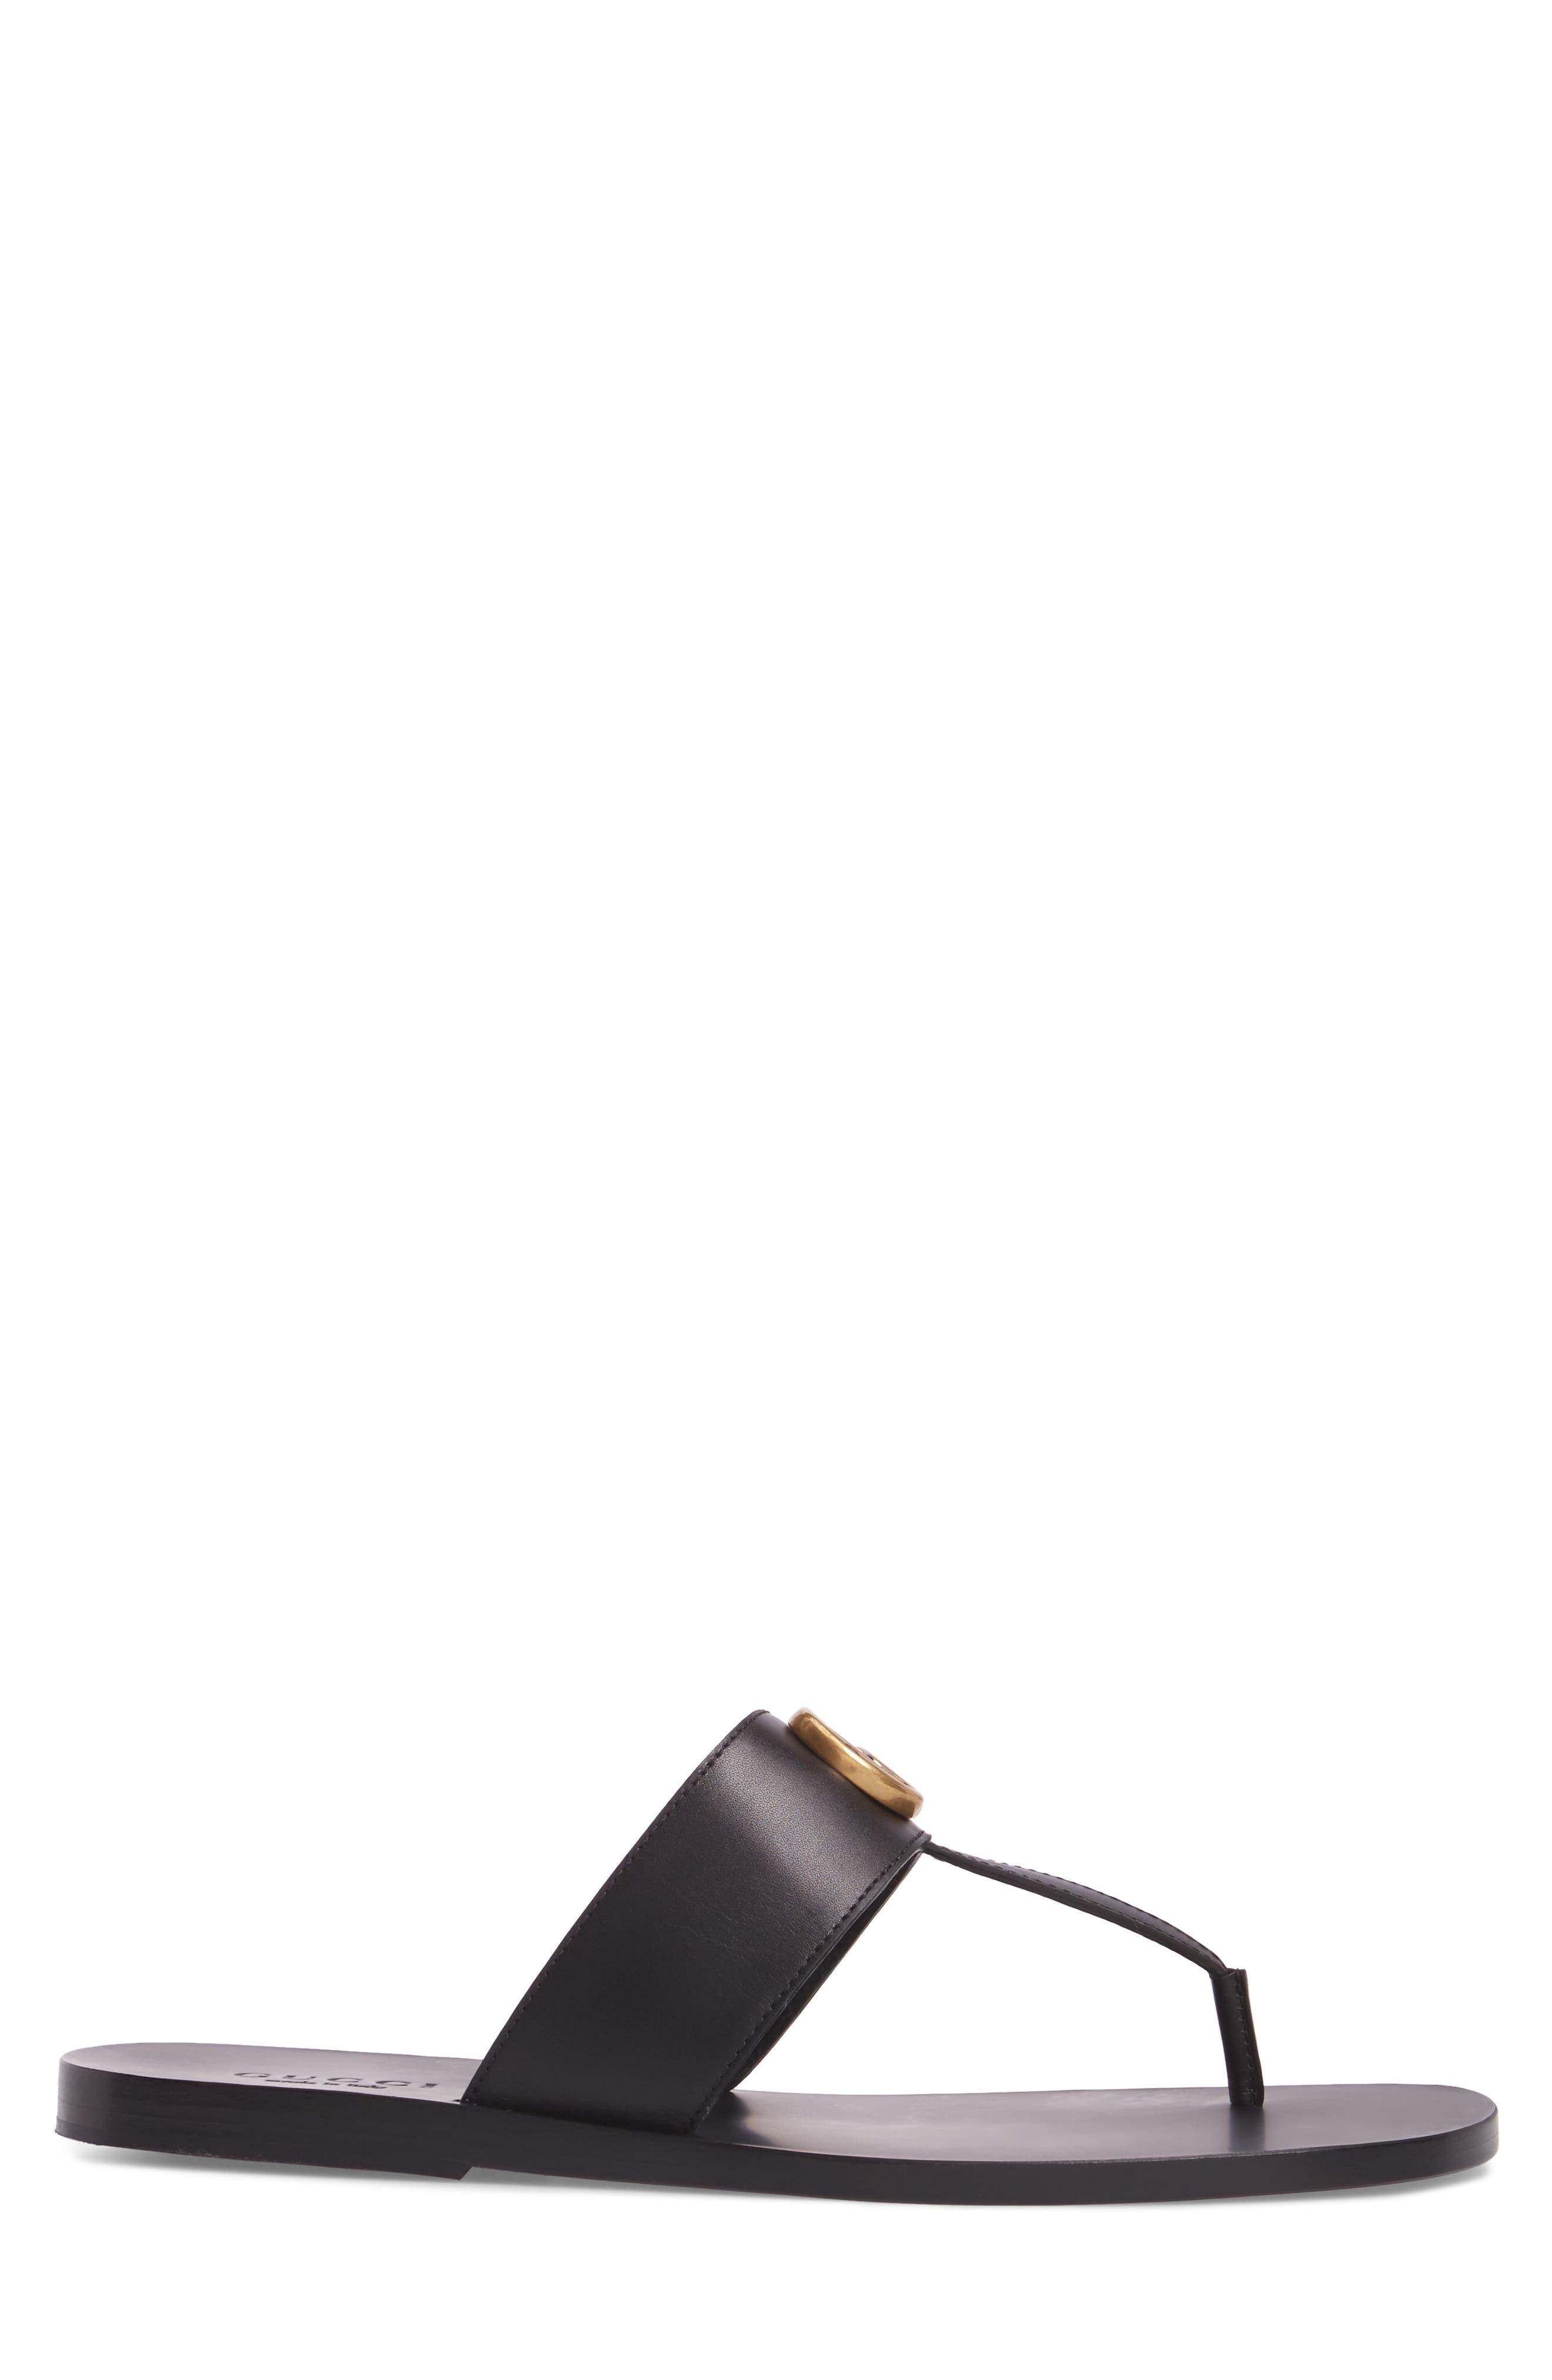 Marmont Double G Leather Thong Sandal,                             Alternate thumbnail 3, color,